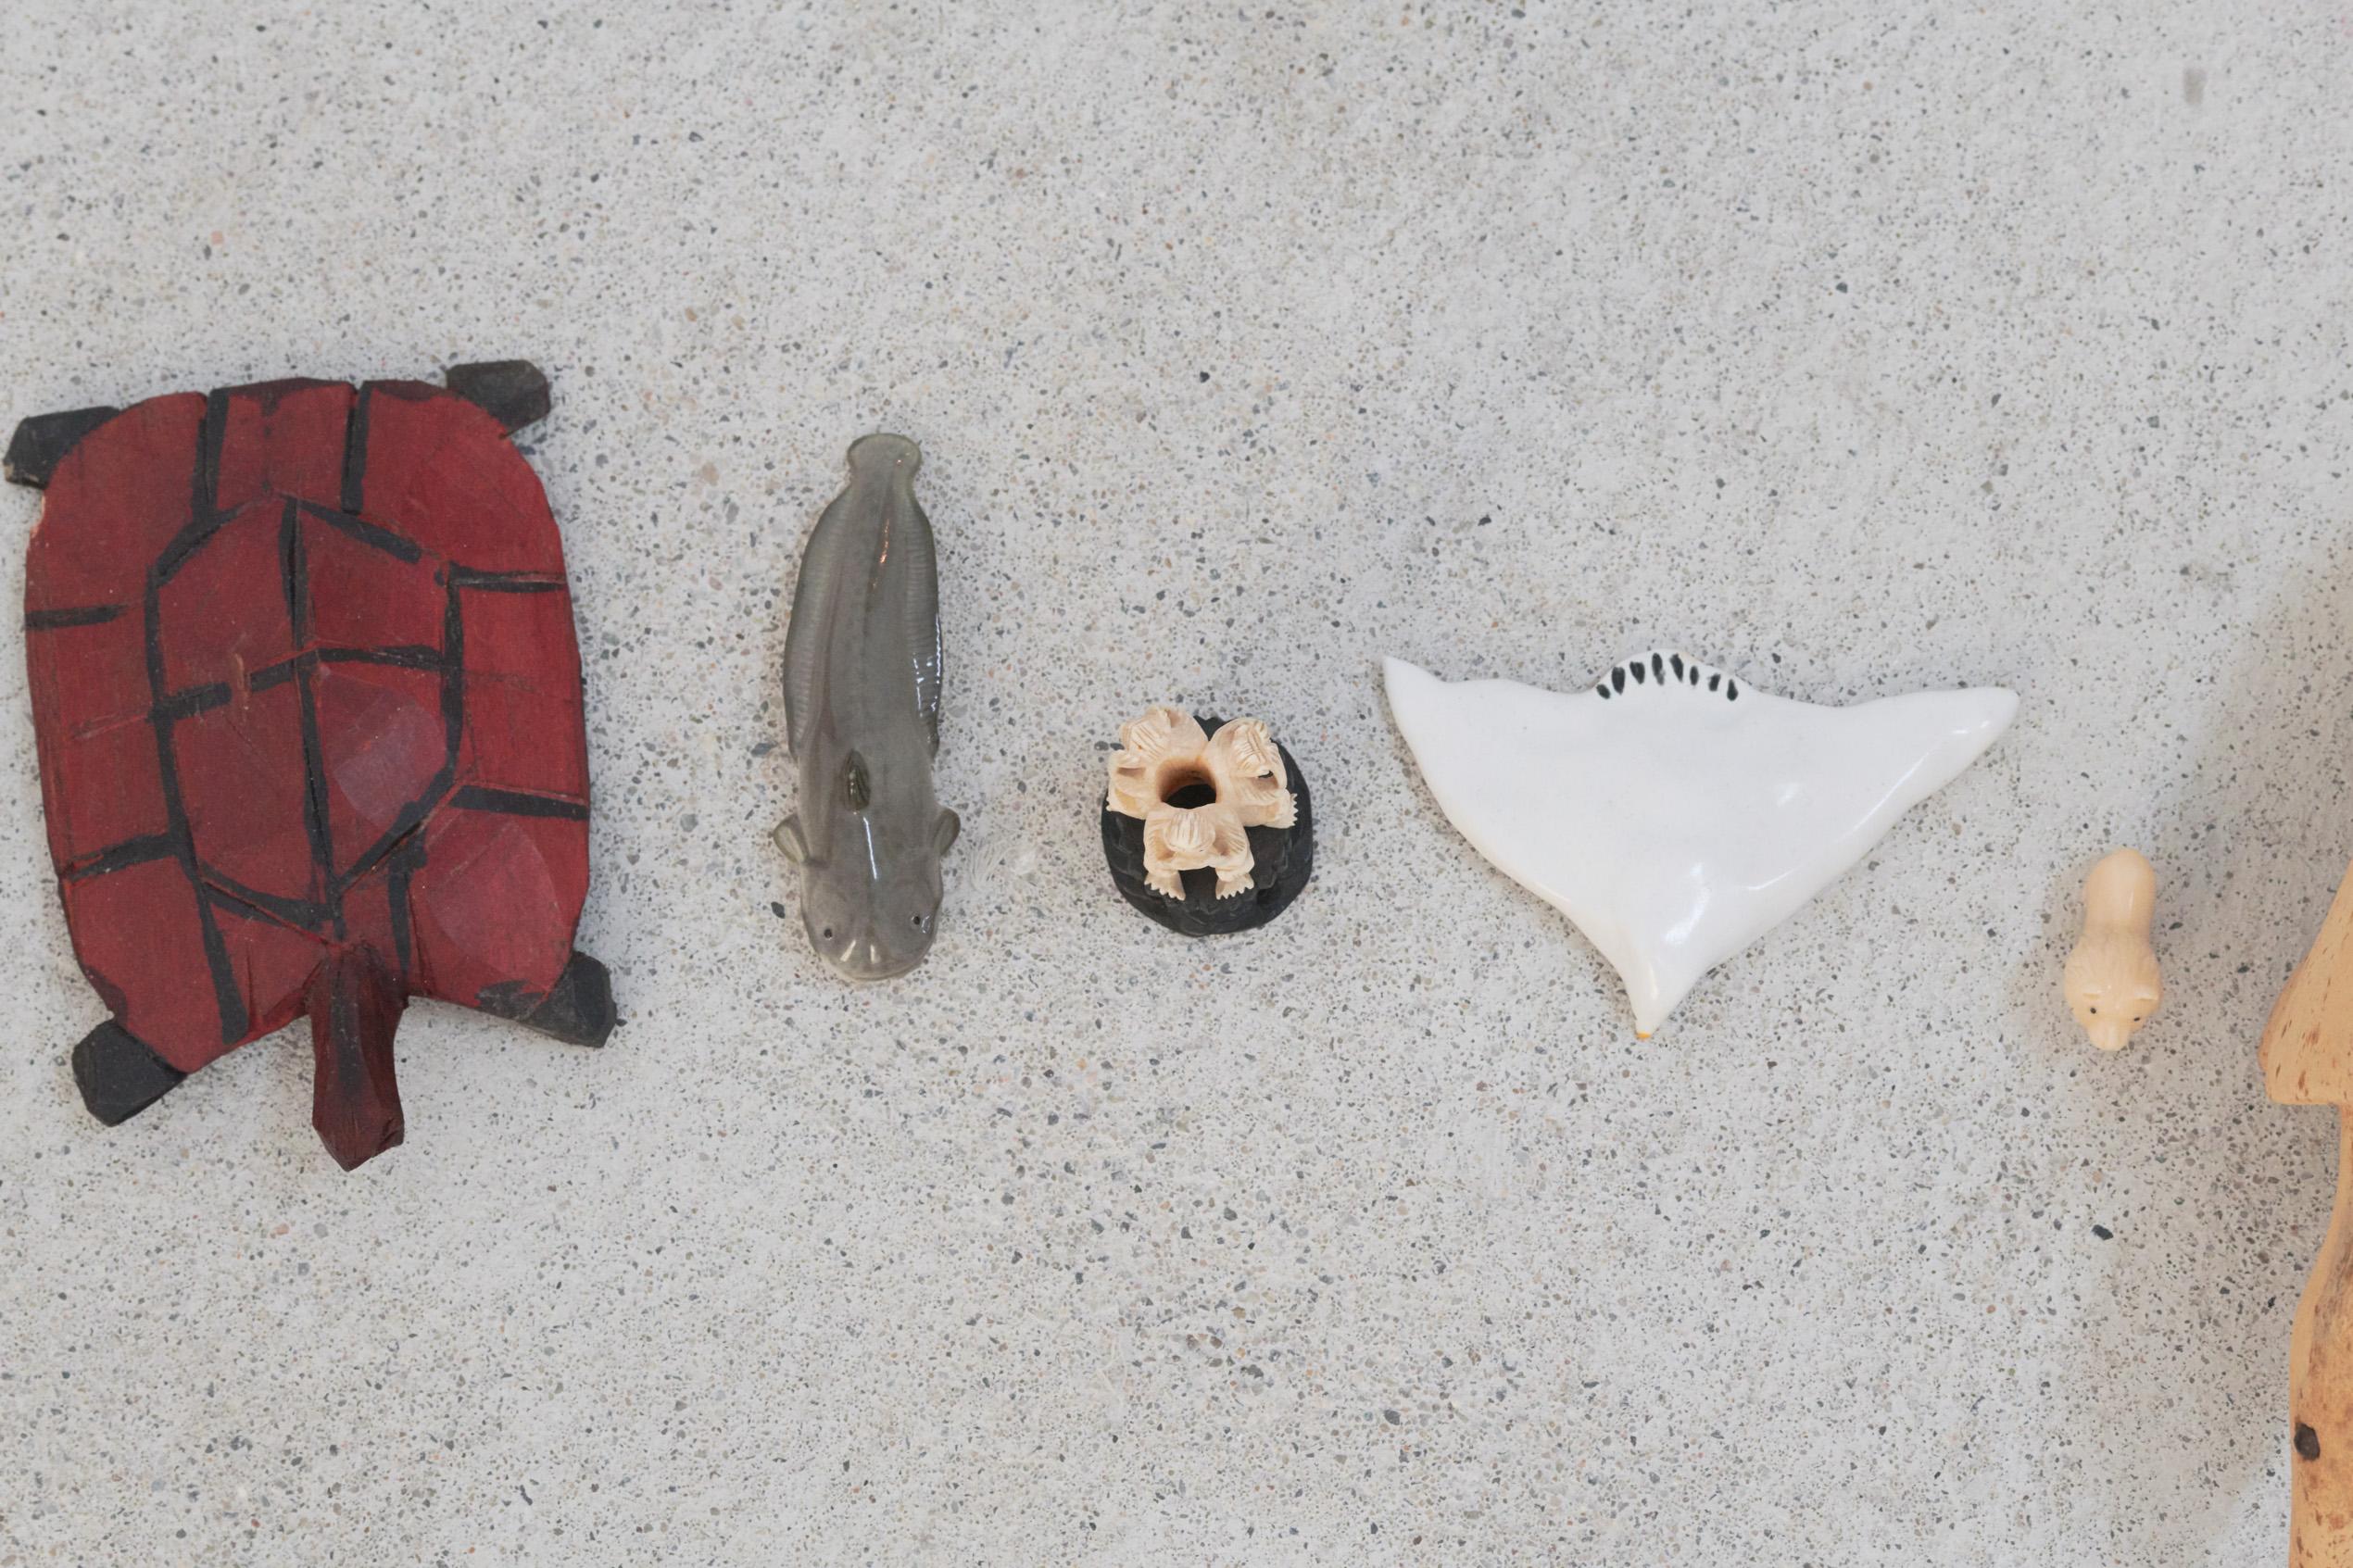 Emily Jones, The Lookers, Porcelain, glass, wicker, plastic, rubber, cotton & wooden animal figures, lollipop (detail)